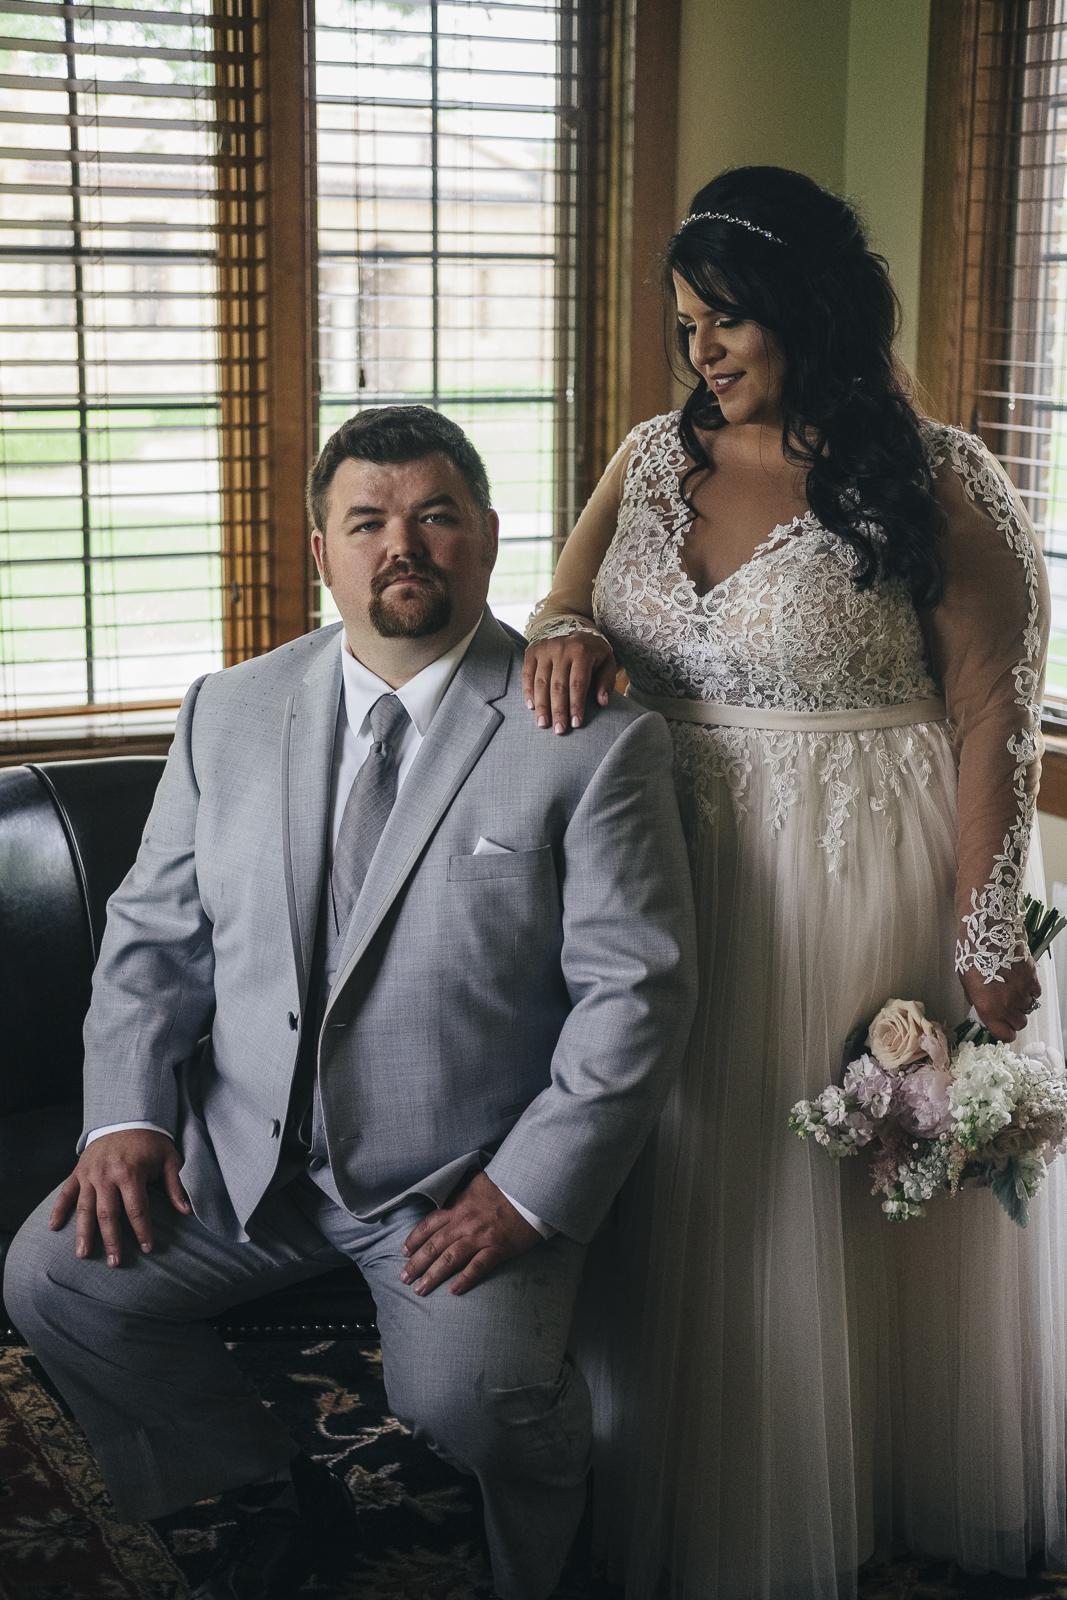 Blush and grey wedding at Nazareth Hall.